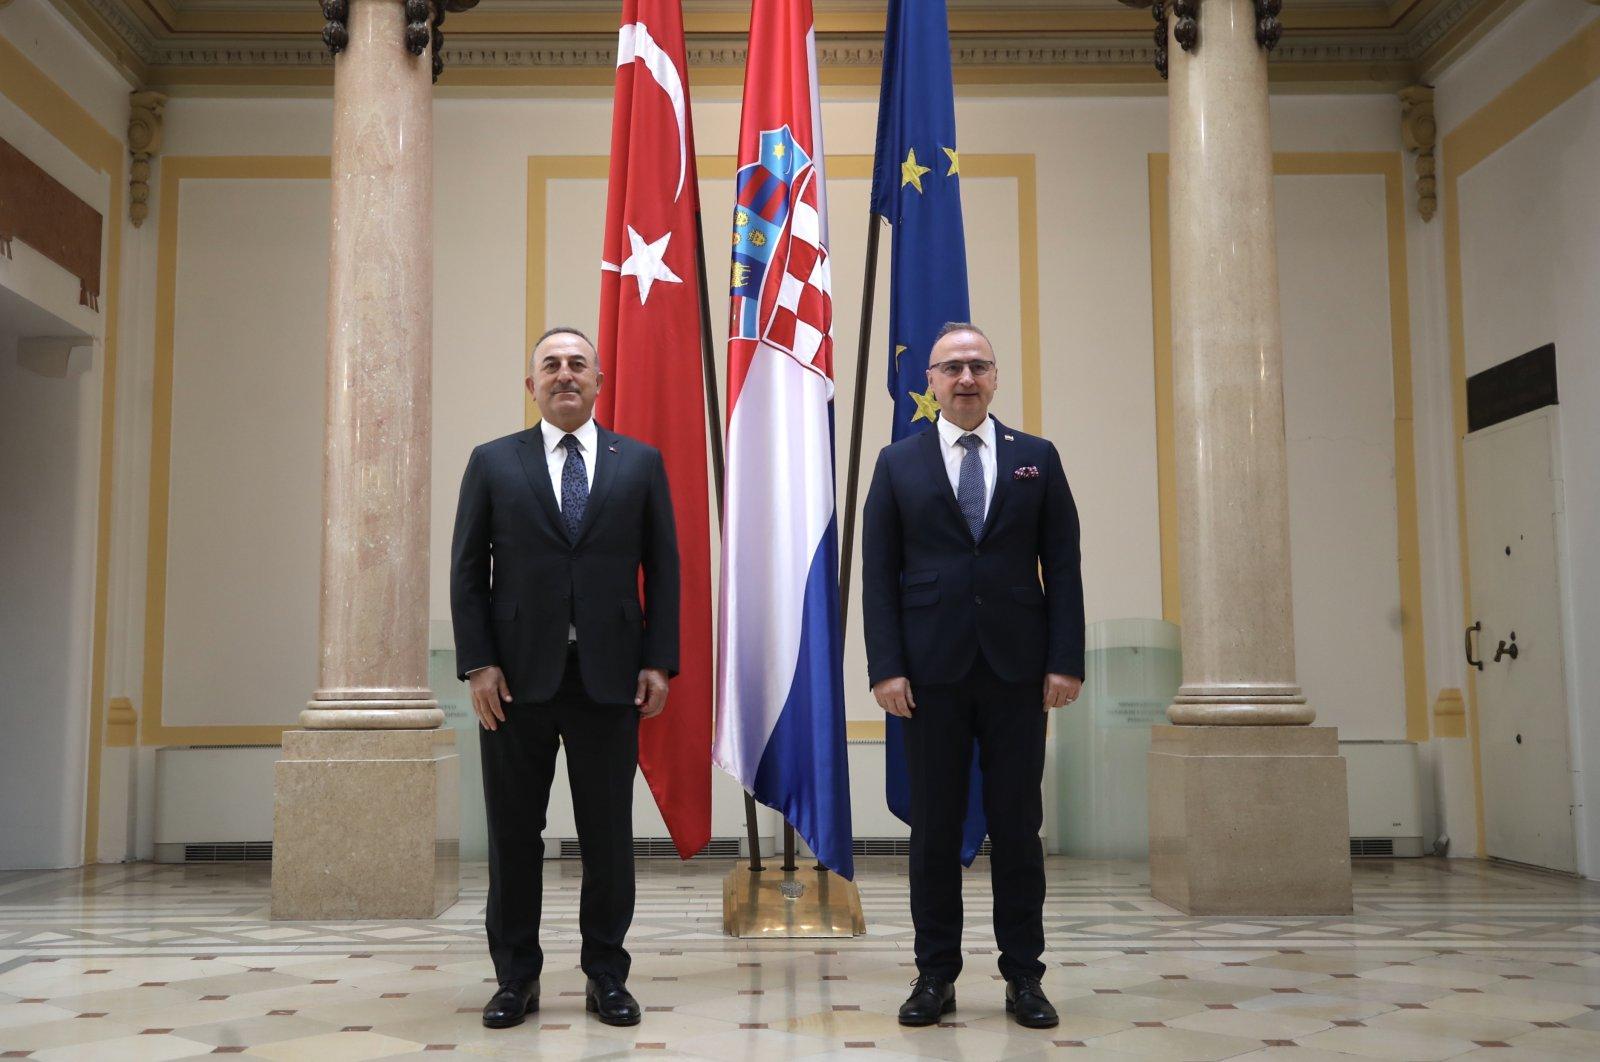 Foreign Minister Mevlüt Çavuşoğlu meets with his Croatian counterpartGordan Grlic Radman, Petrinja, Croatia, Feb.26, 2021. (AA)